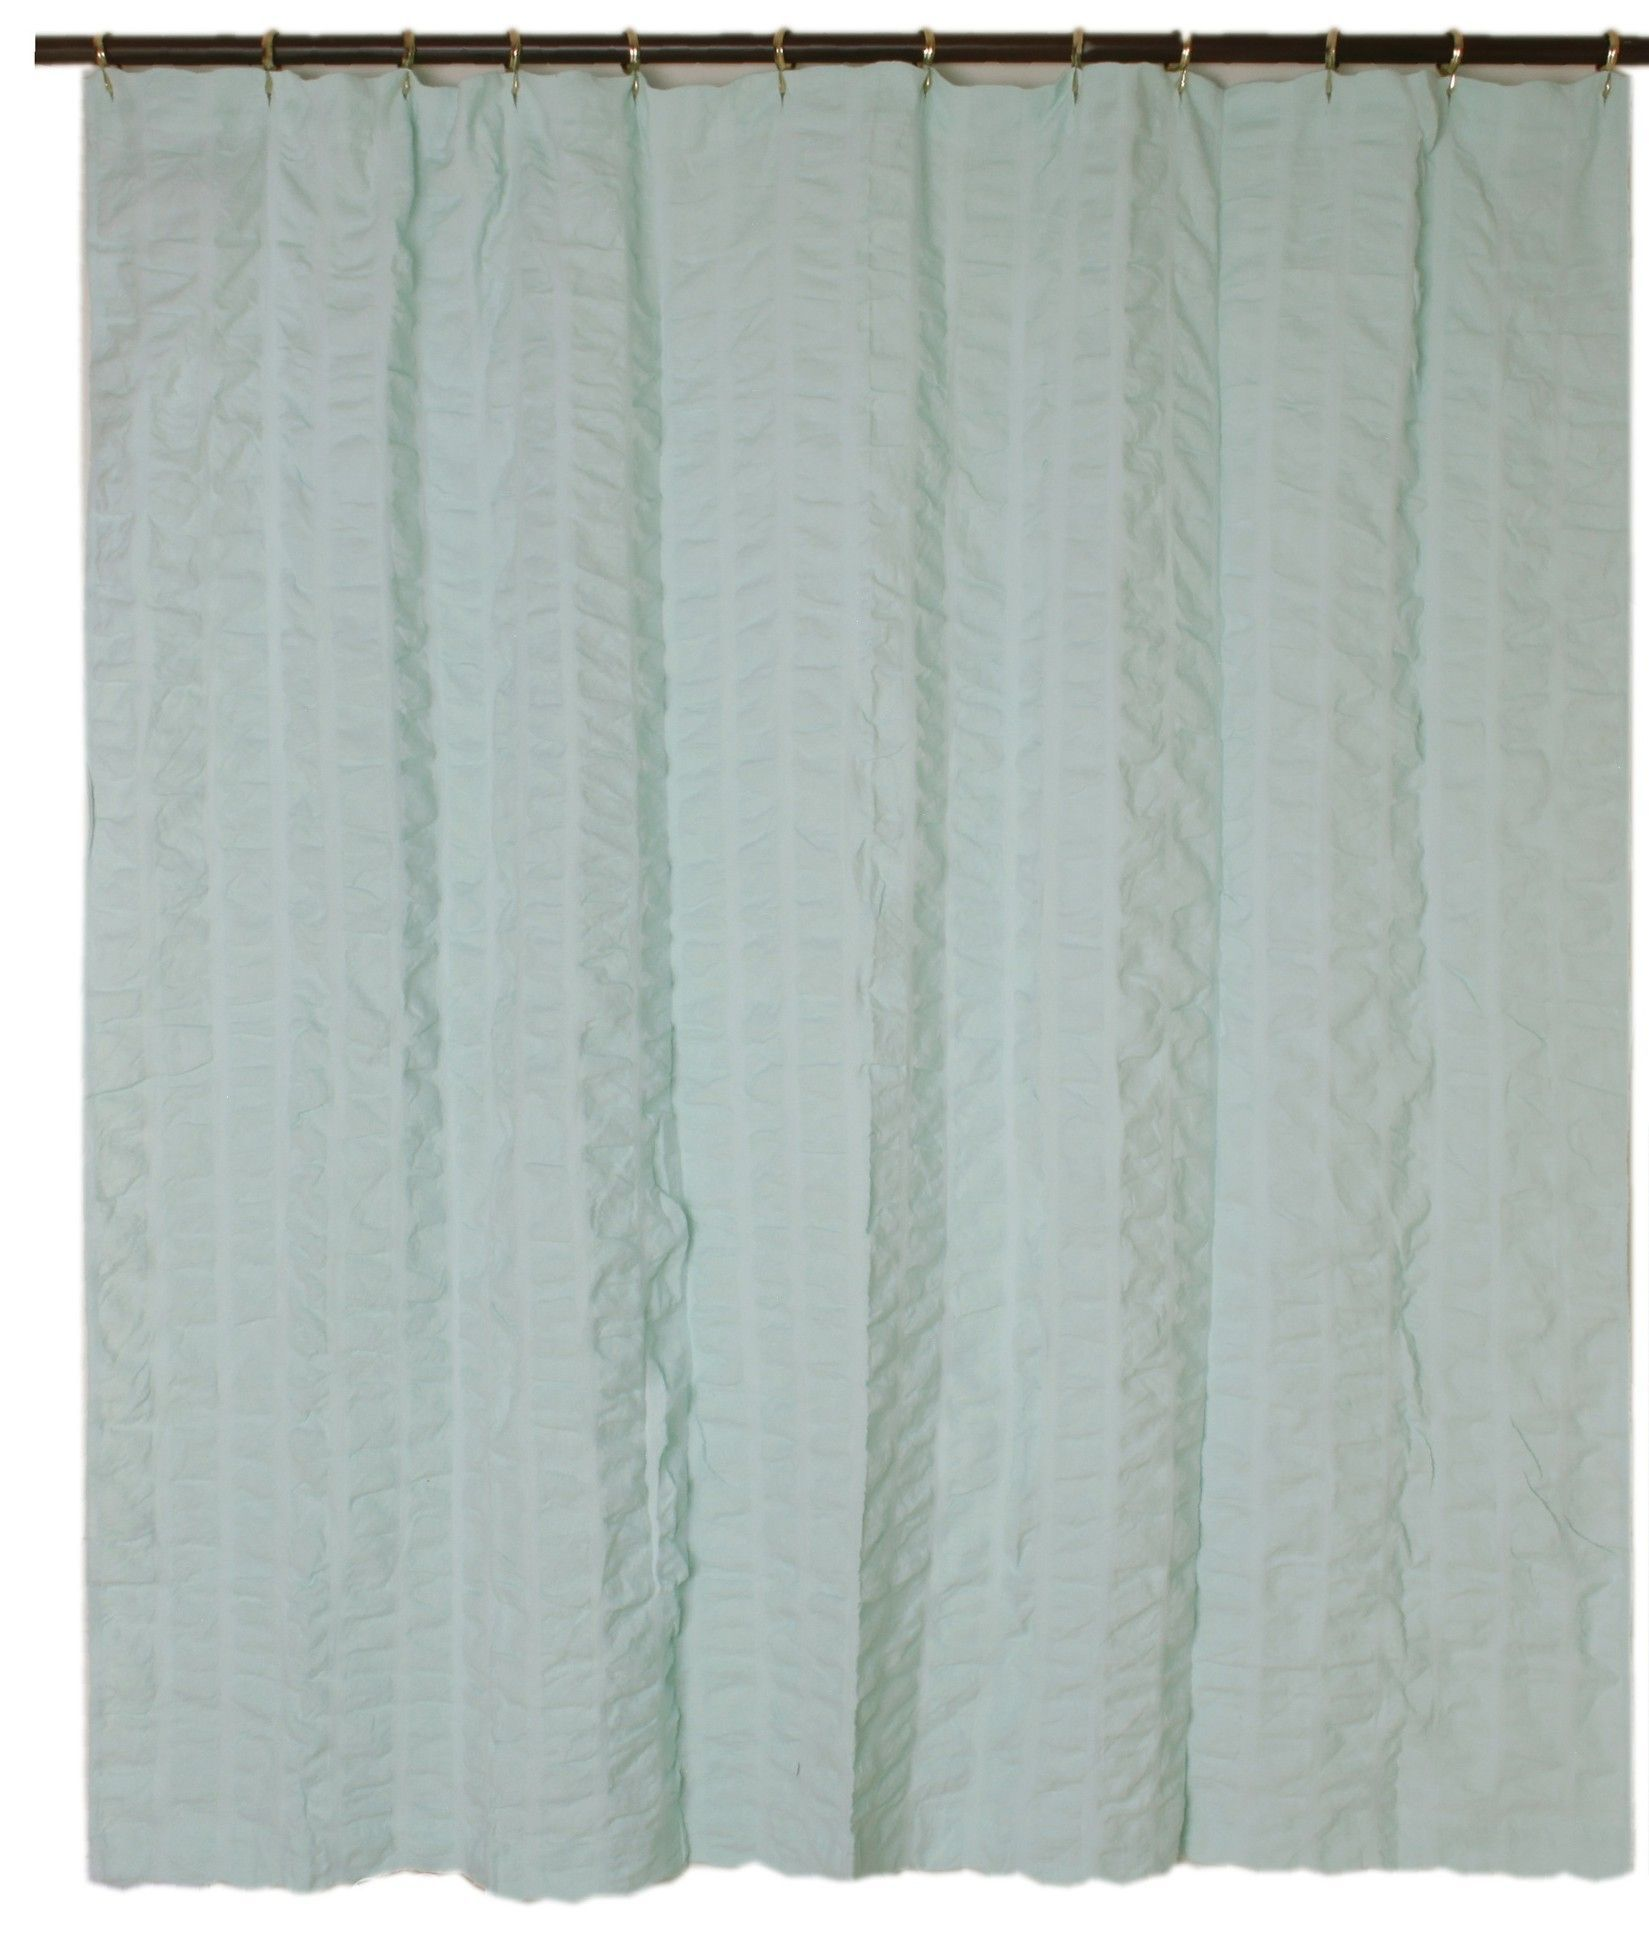 Cotton Waterfalls Shower Curtain Blue Shower Curtains Waterfall